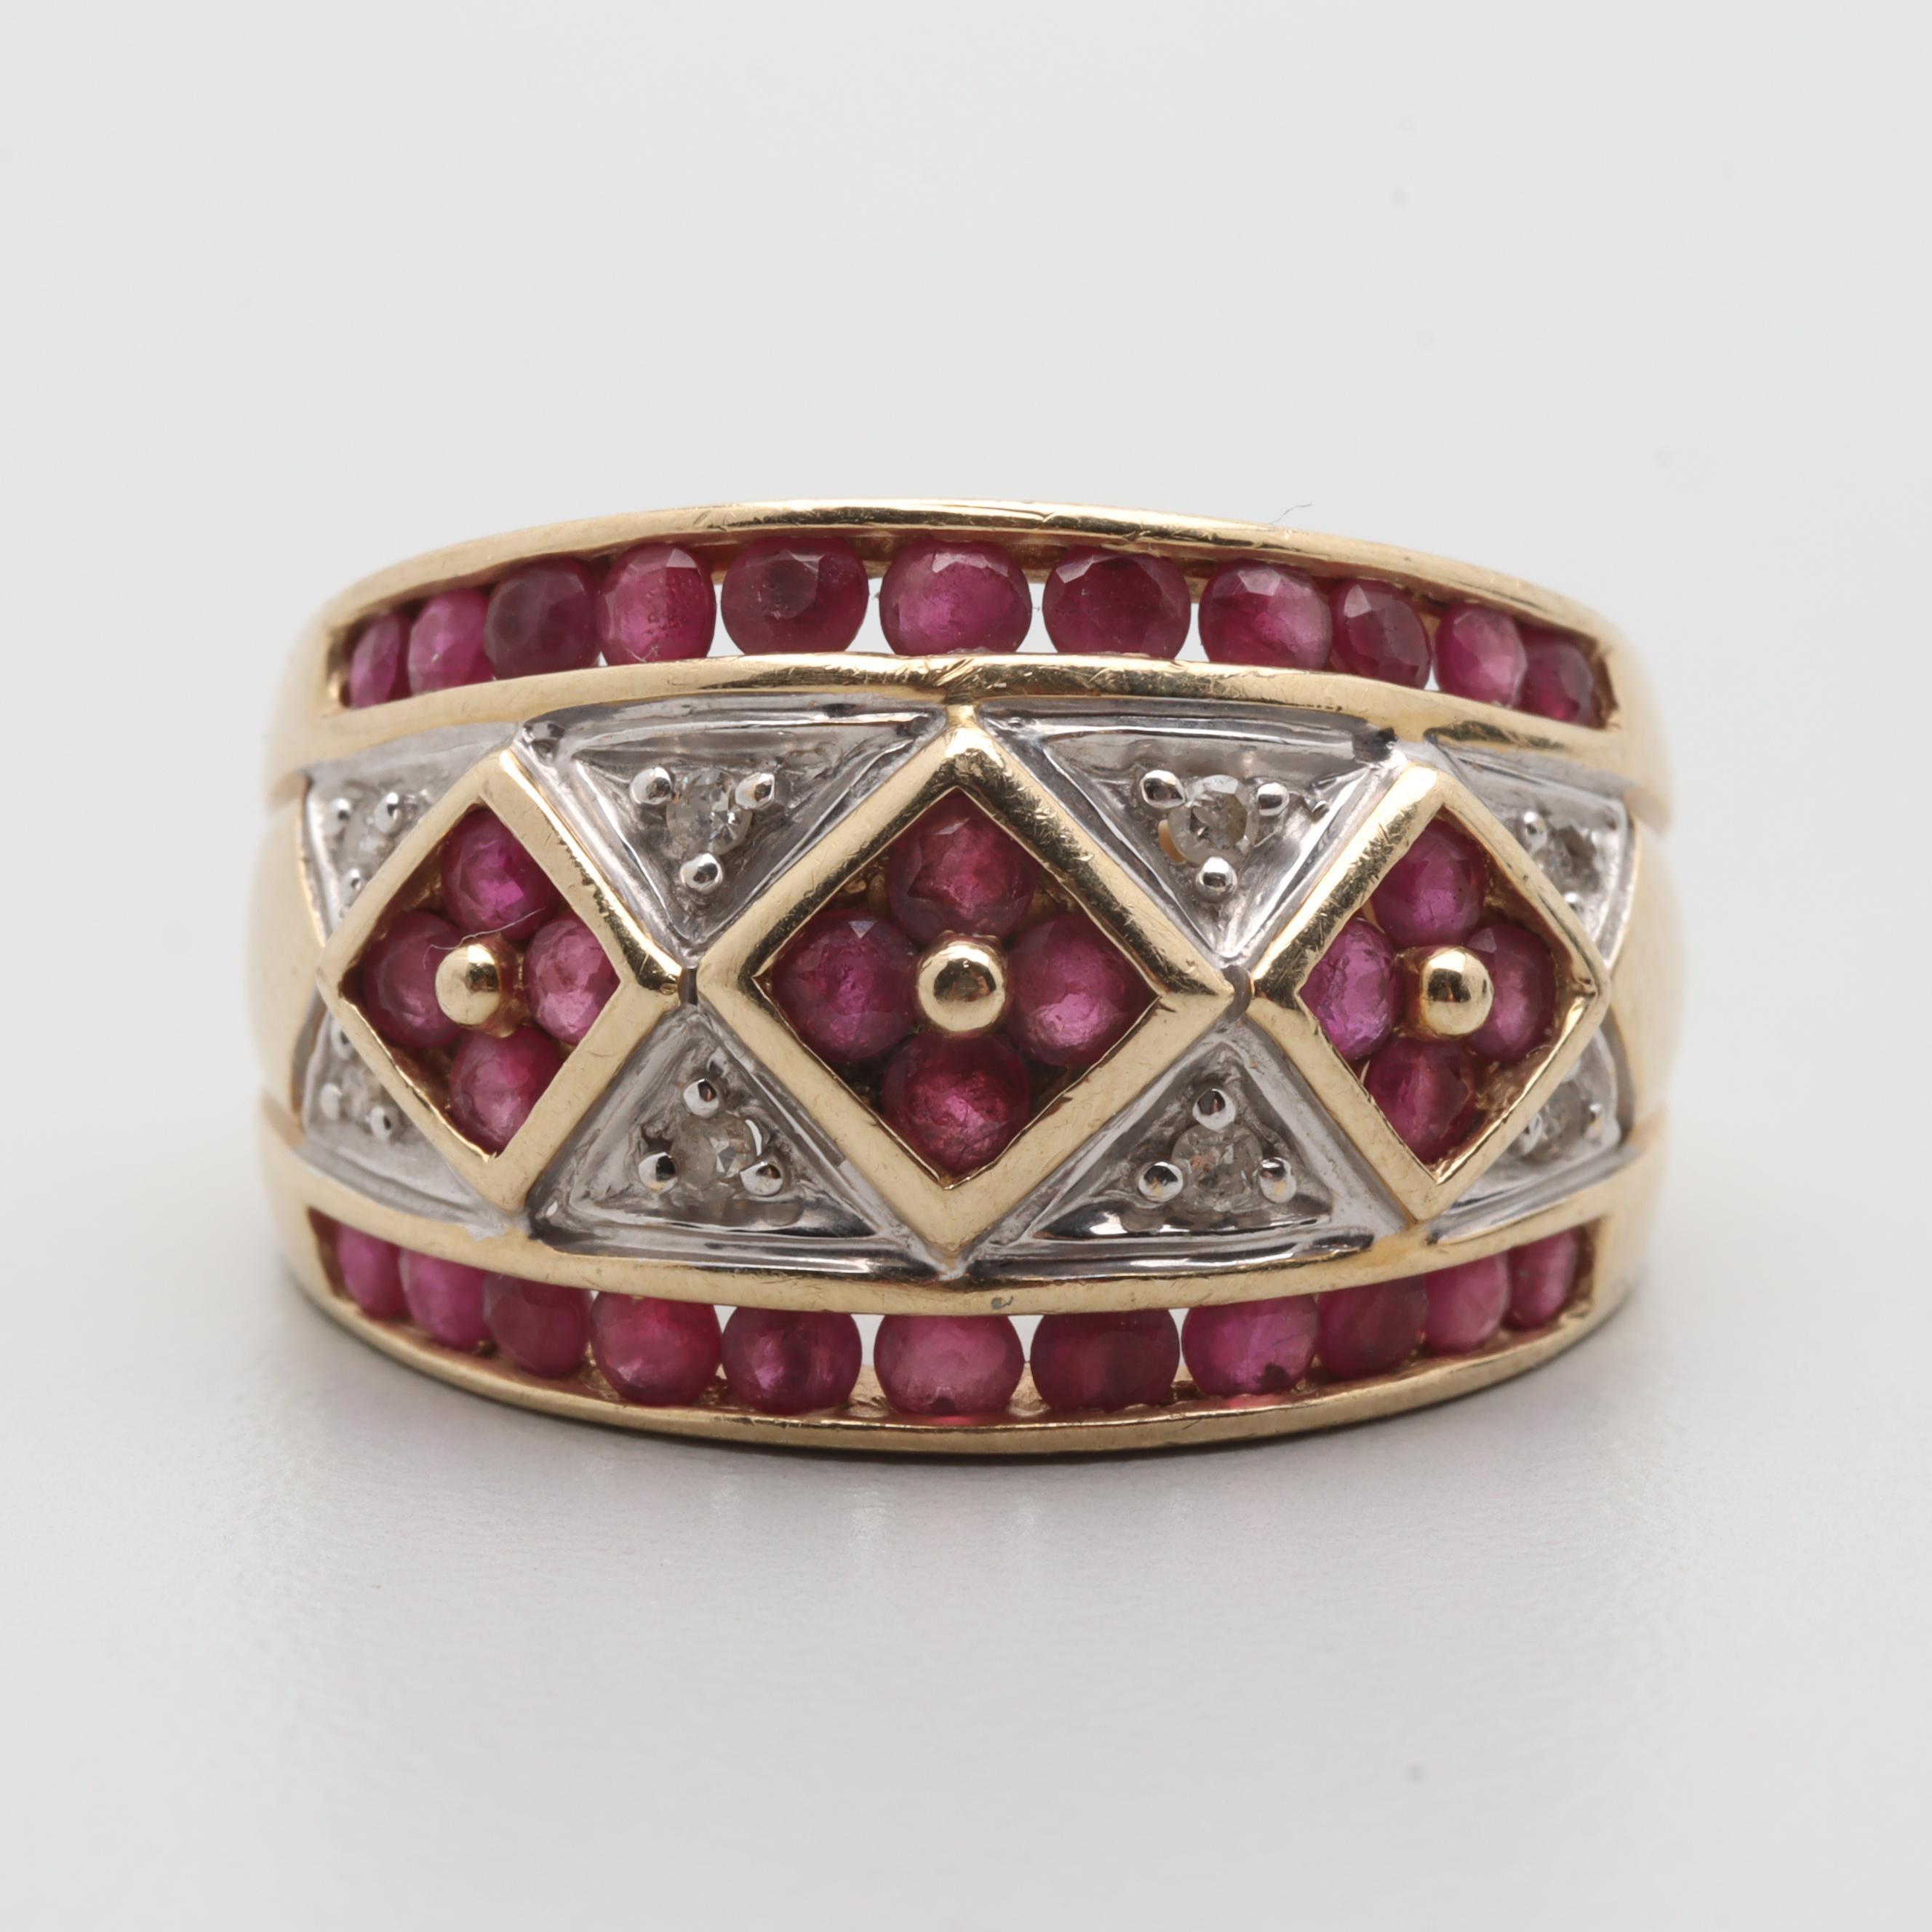 Alwand Vahan 14K Yellow Gold Ruby and Diamond Ring